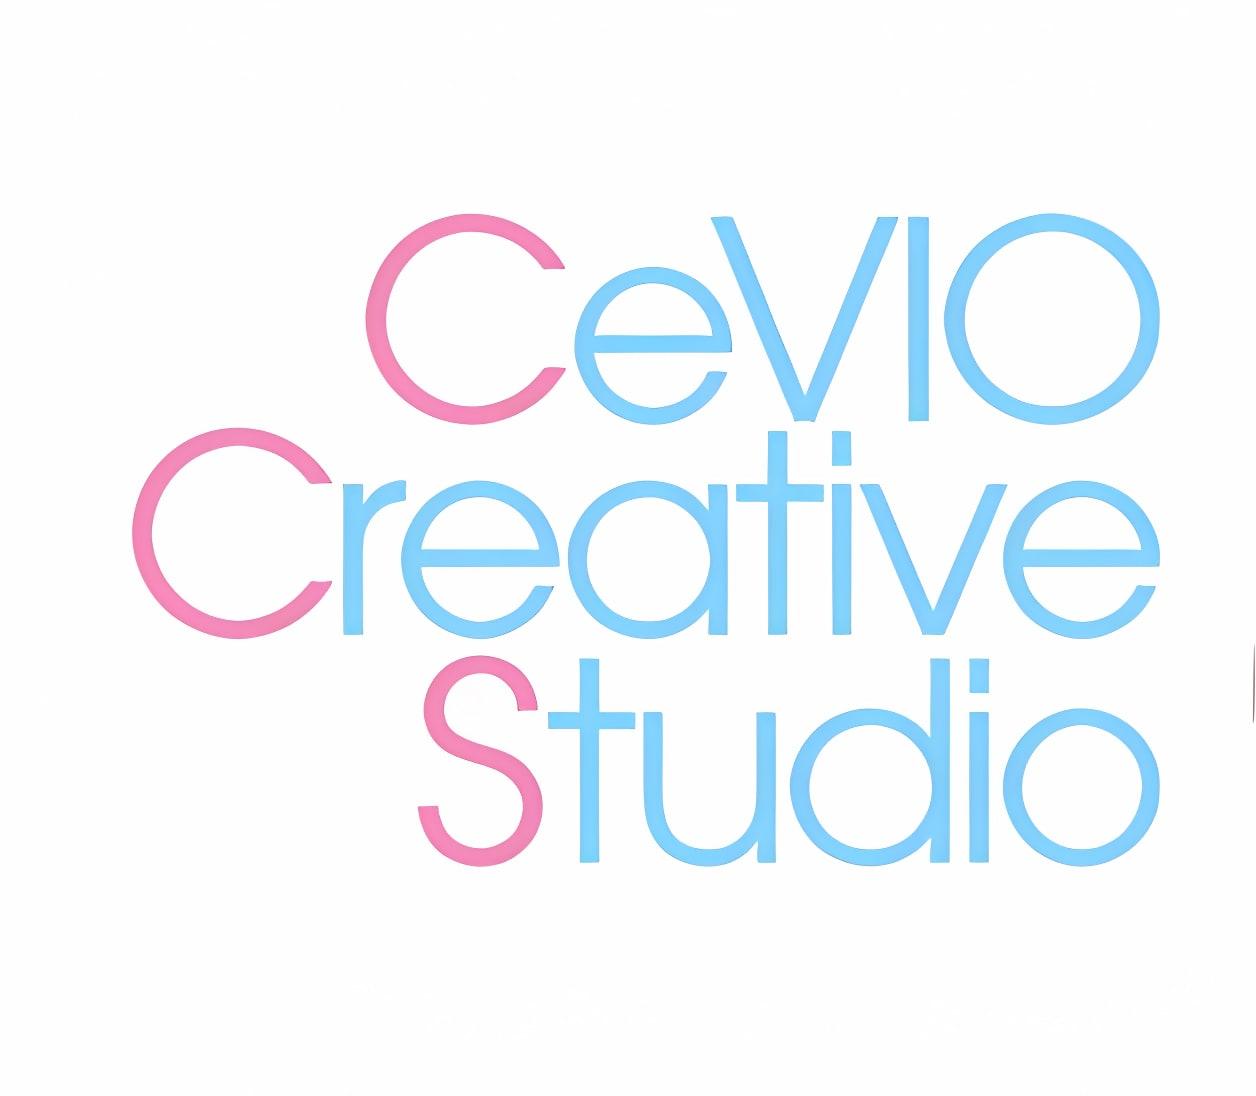 CeVIO Creative Studio S